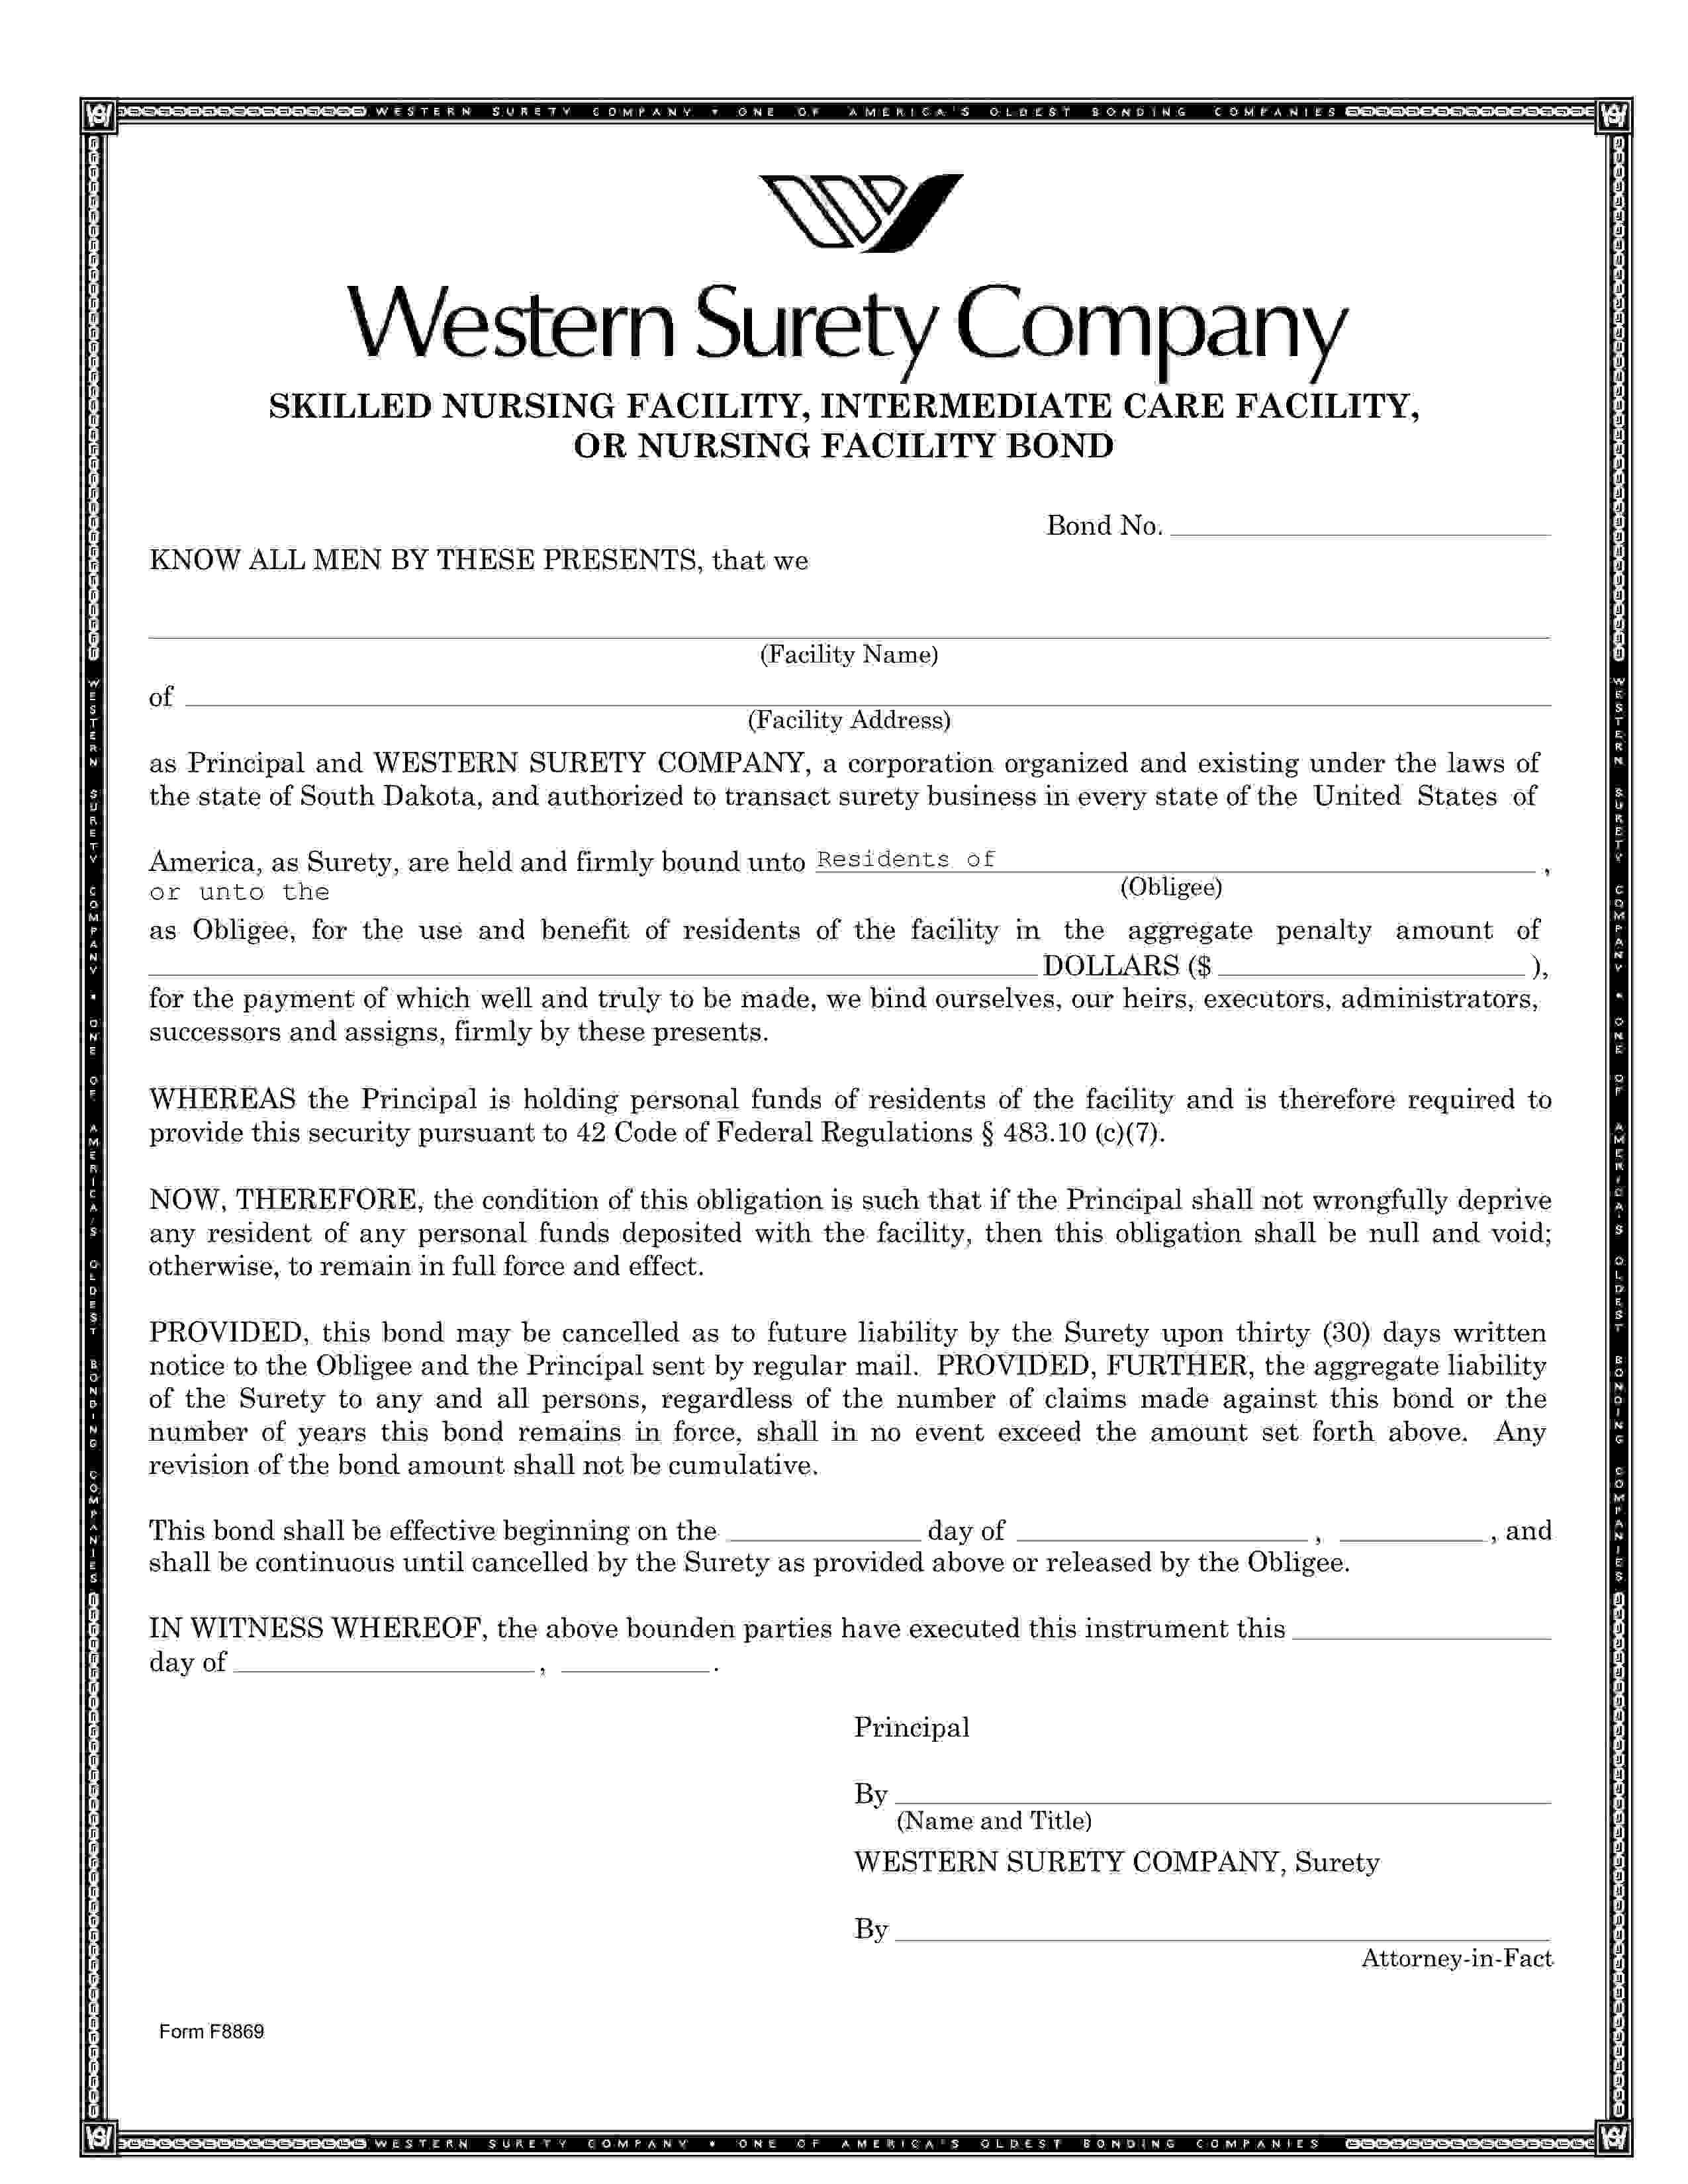 Nursing Facility Resident Trust Fund sample image